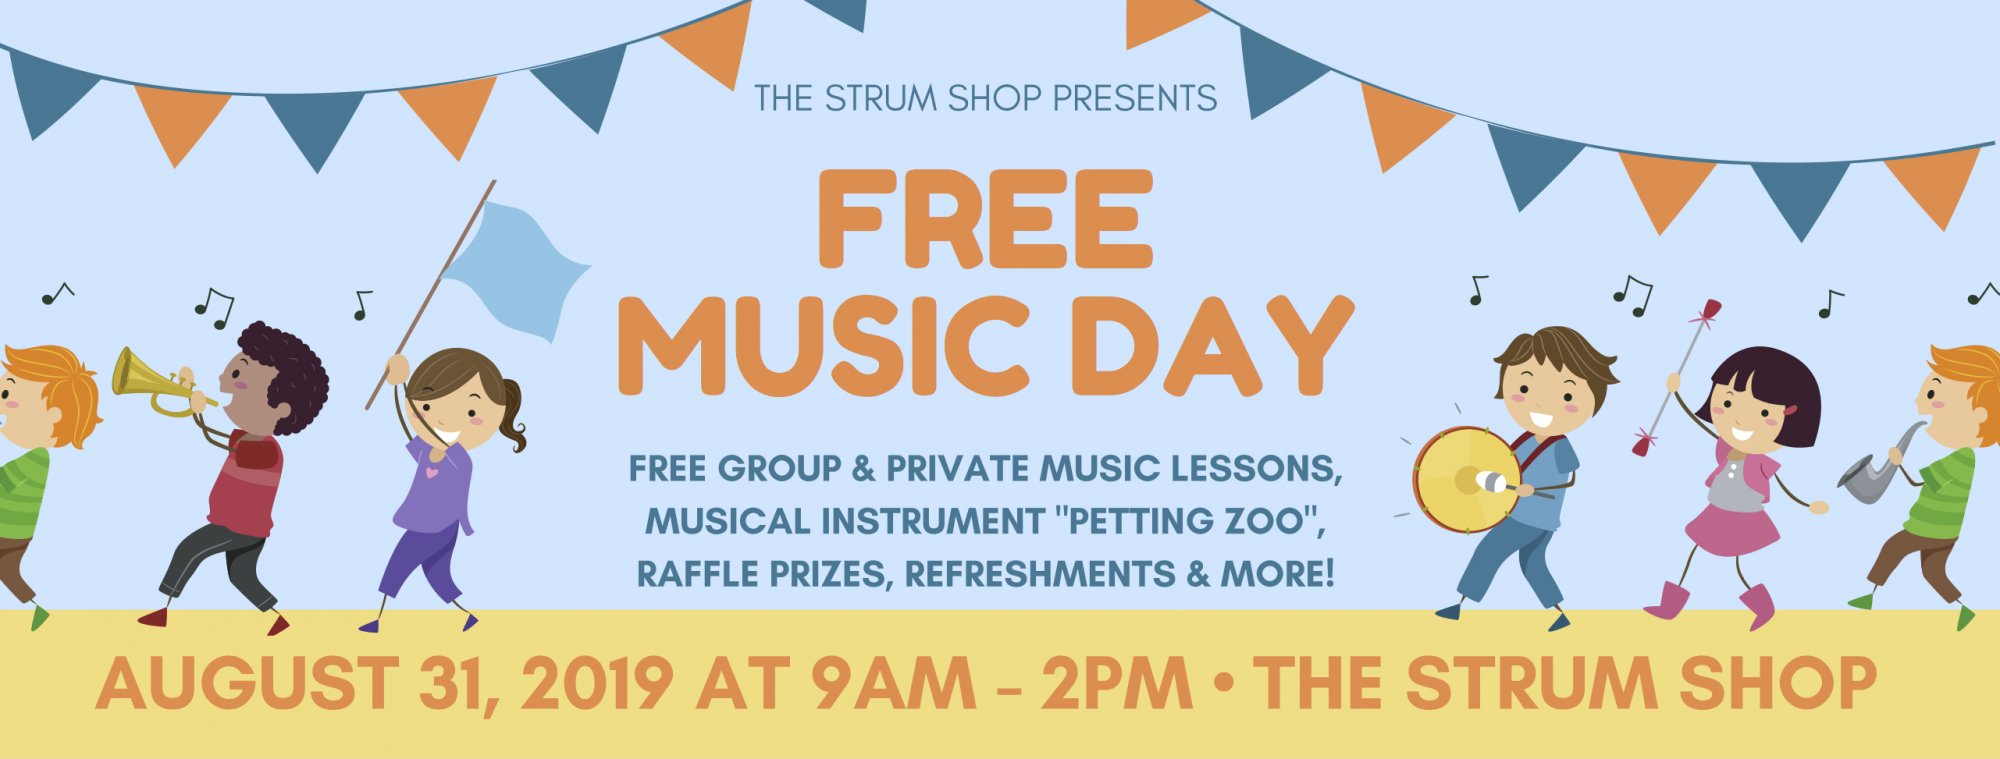 Free Music Day